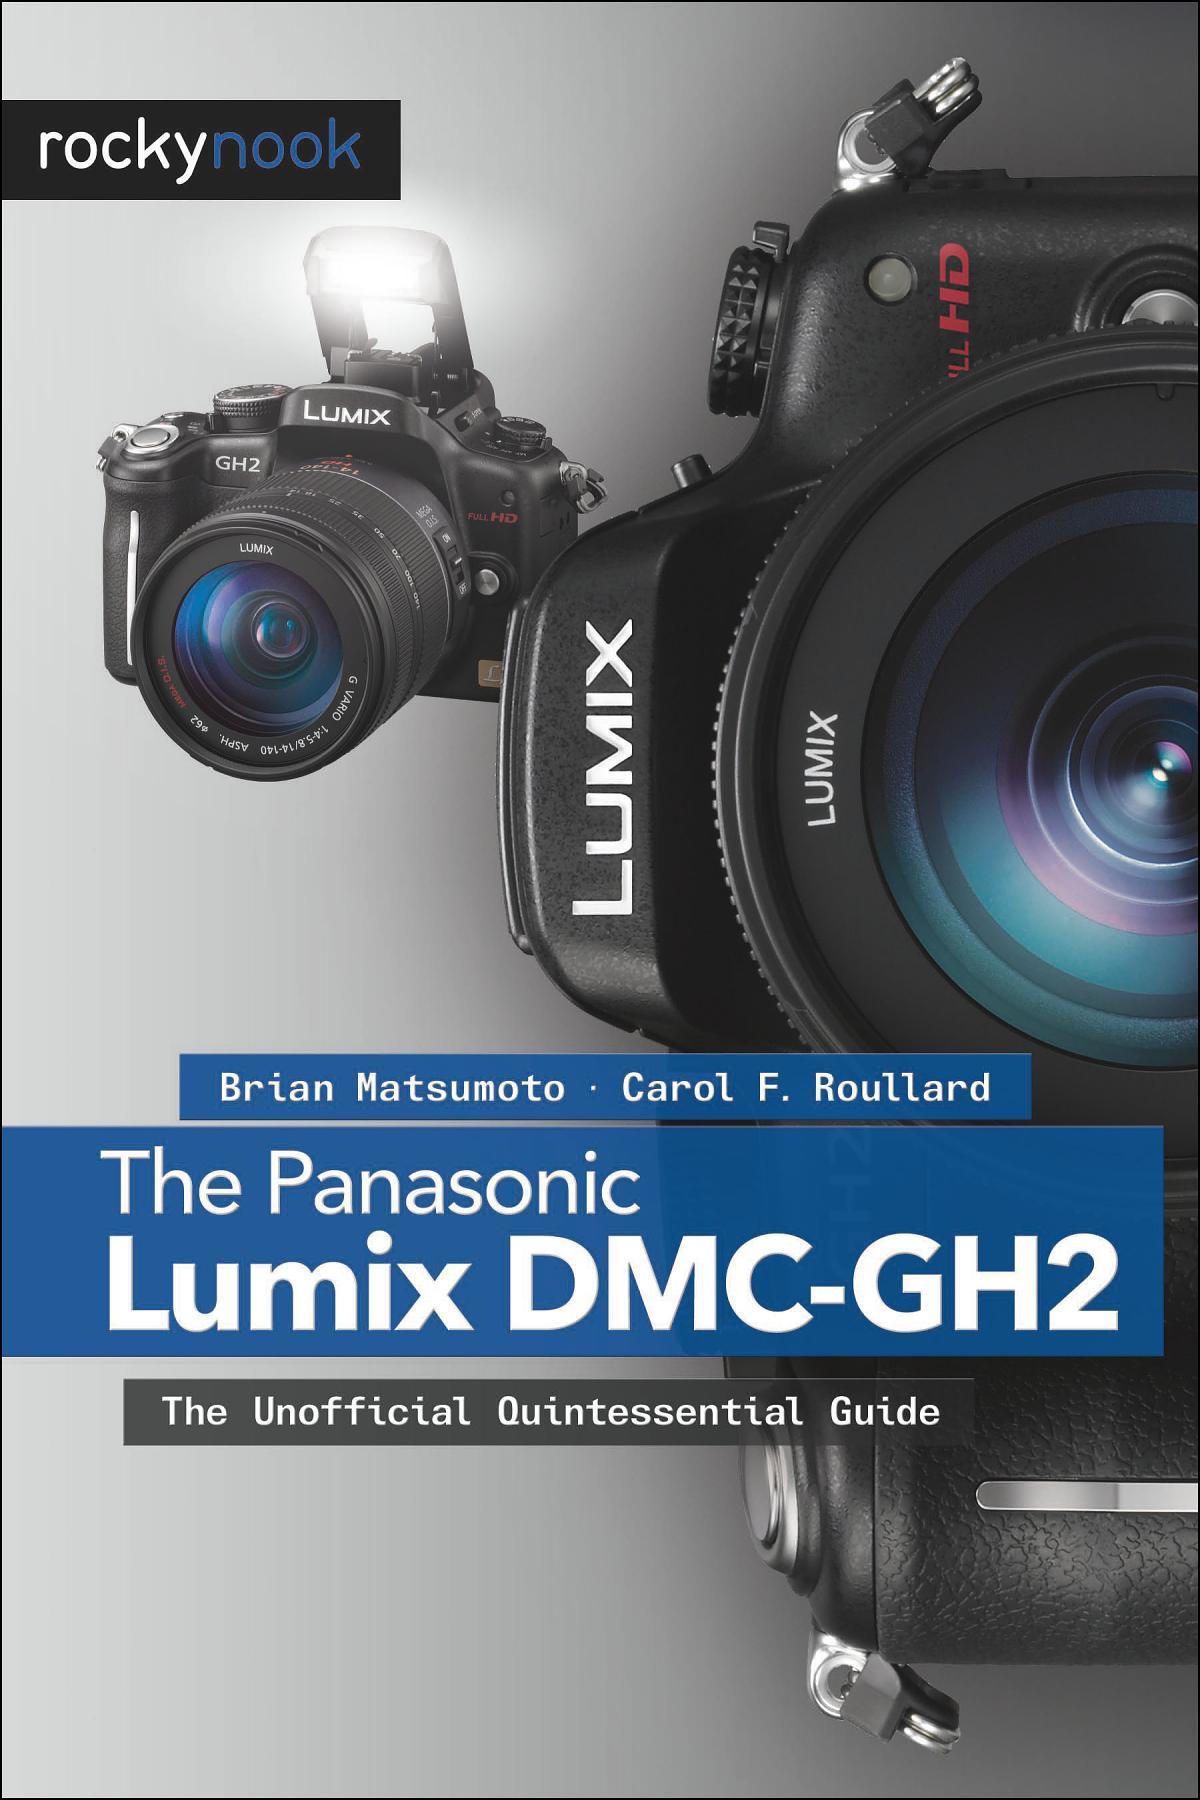 The Panasonic Lumix DMC-GH2 (96504491) photo